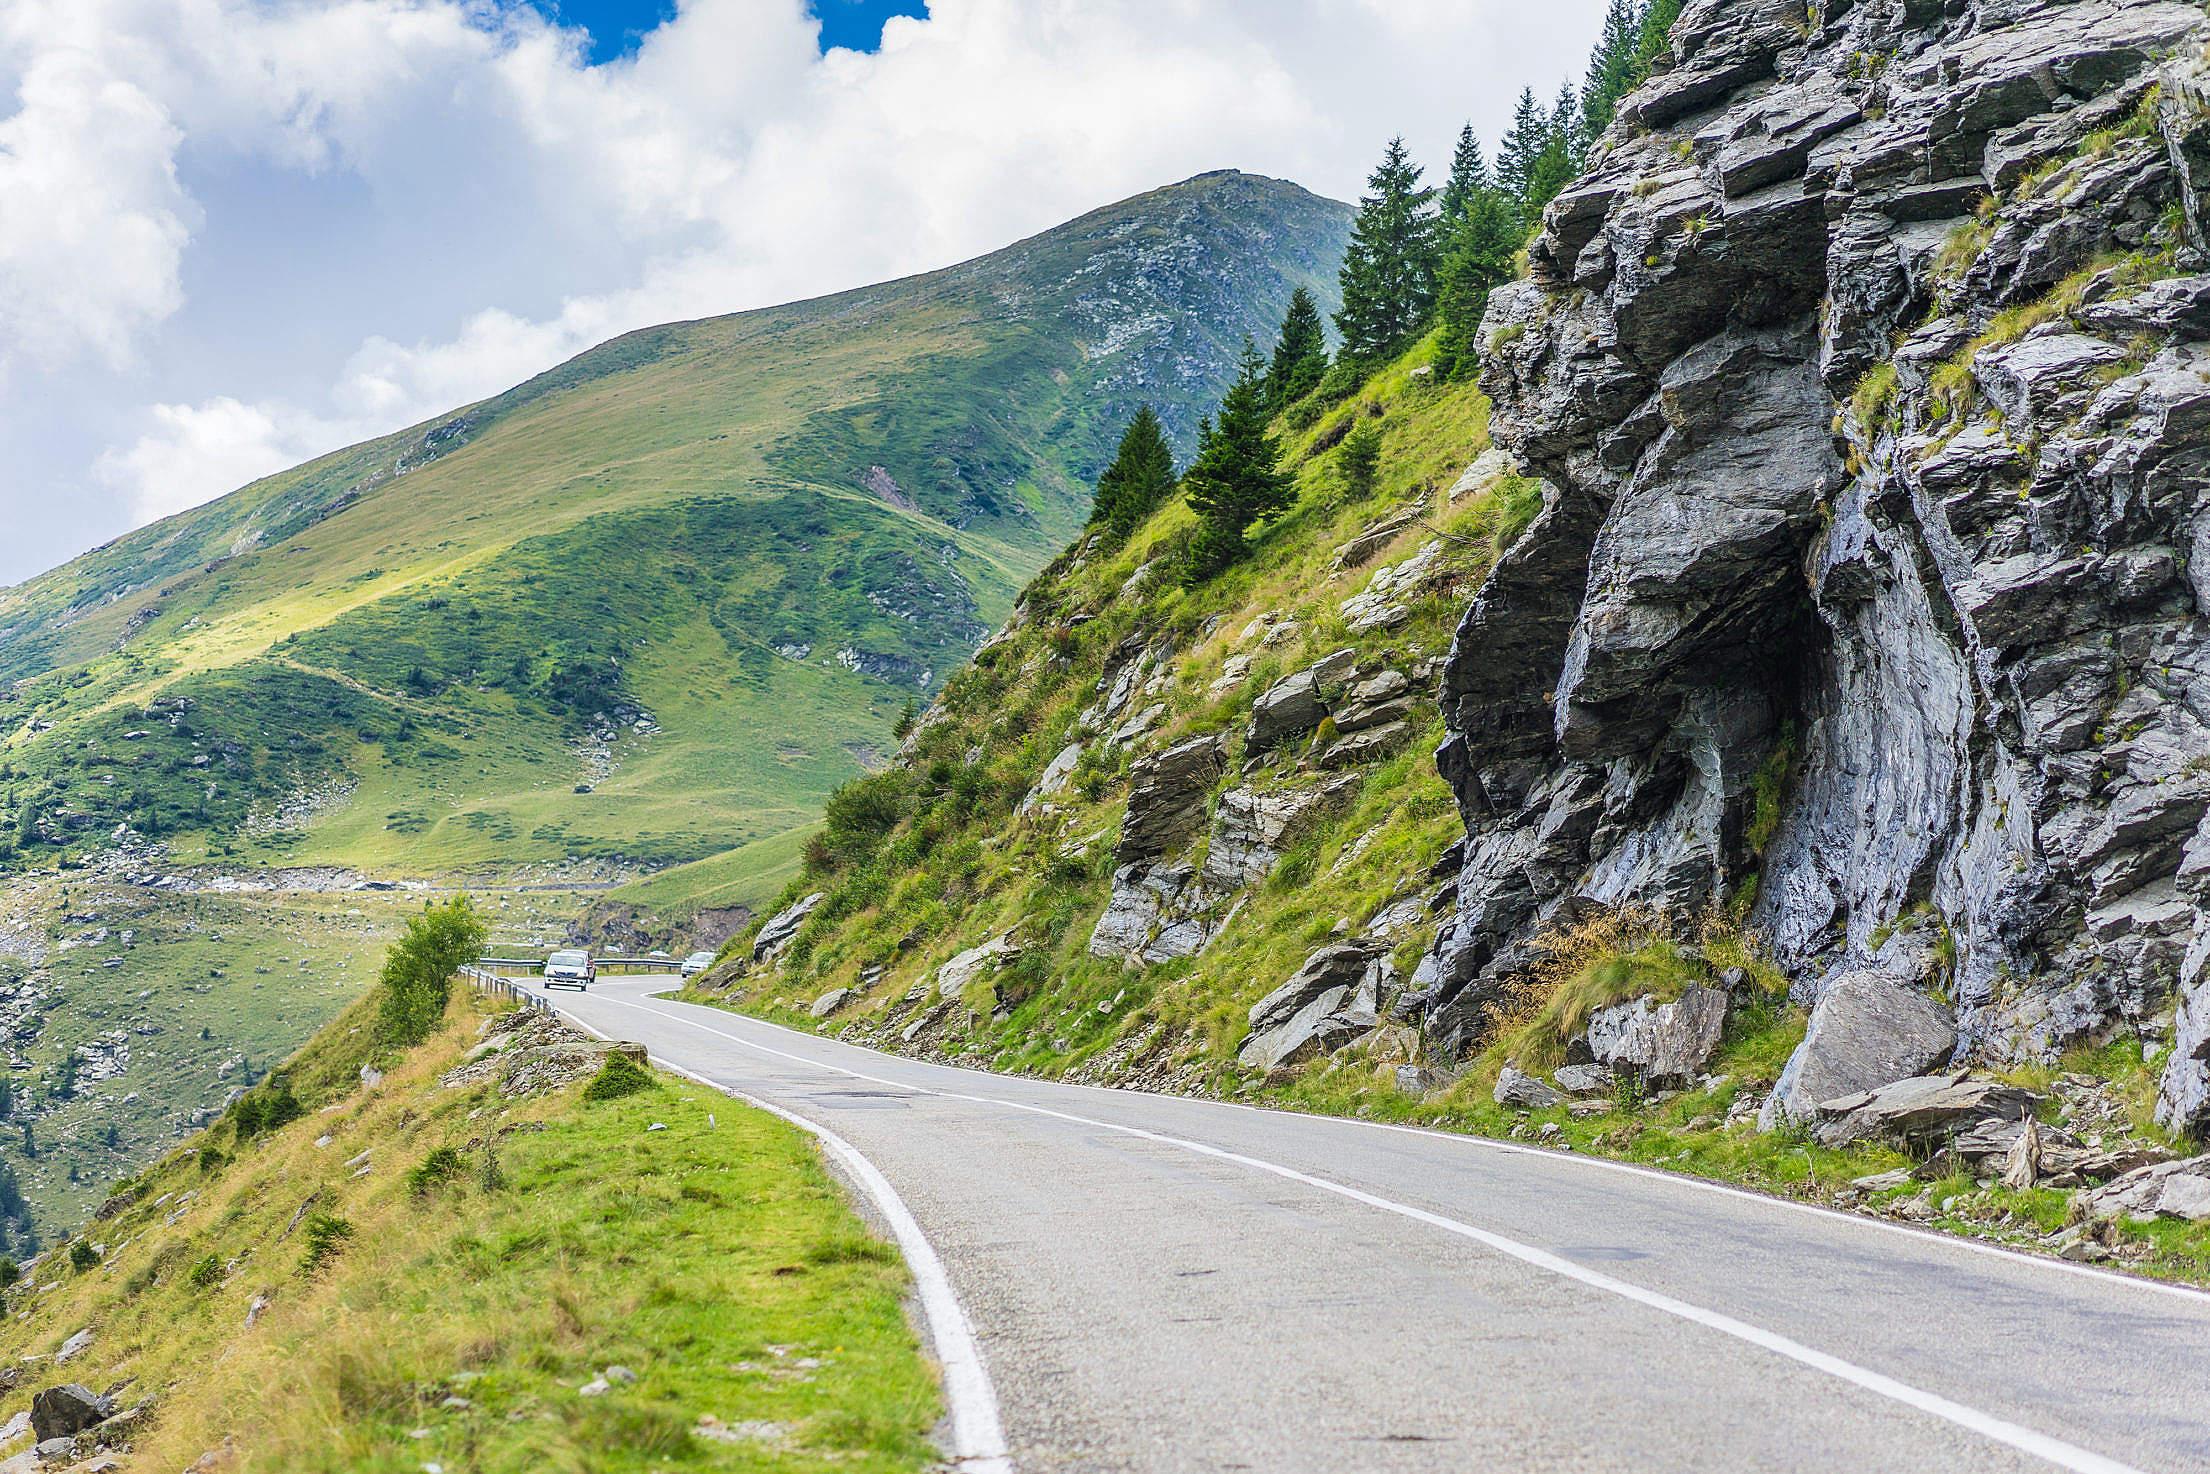 Long Road Along Romanian Mountains and Rocks Free Stock Photo